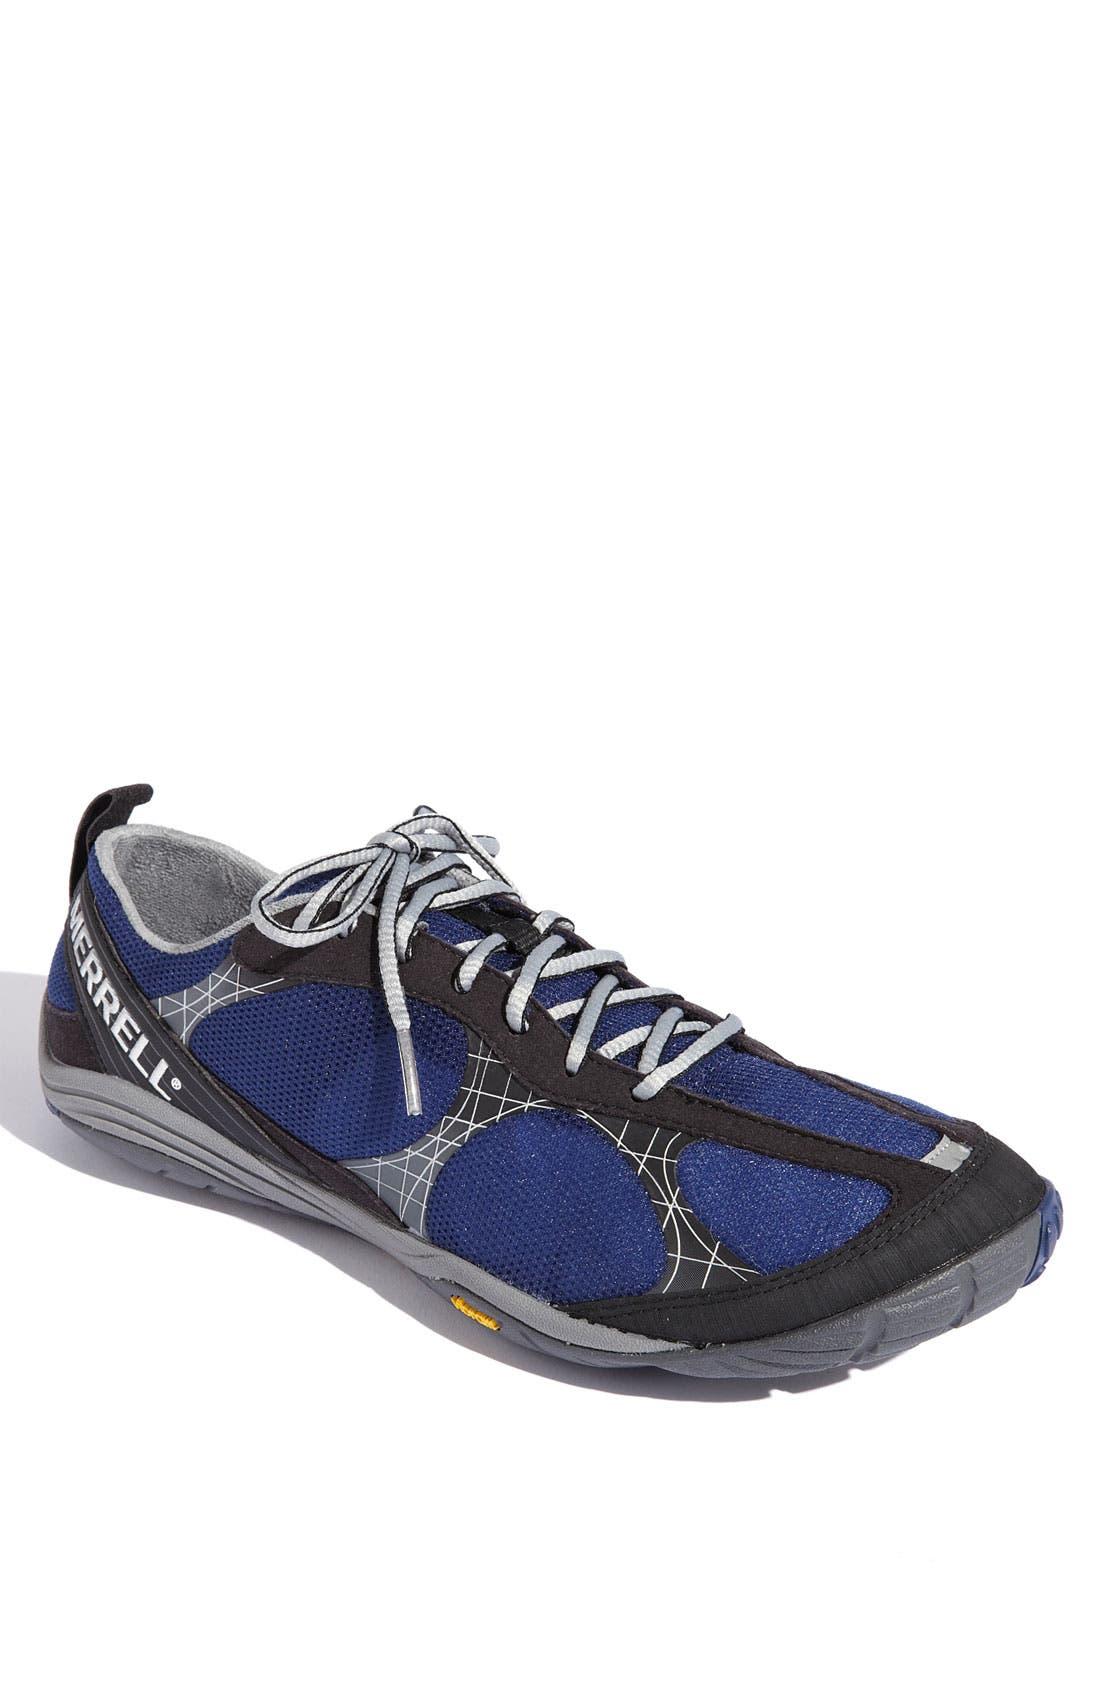 Main Image - Merrell 'Road Glove' Running Shoe (Men)